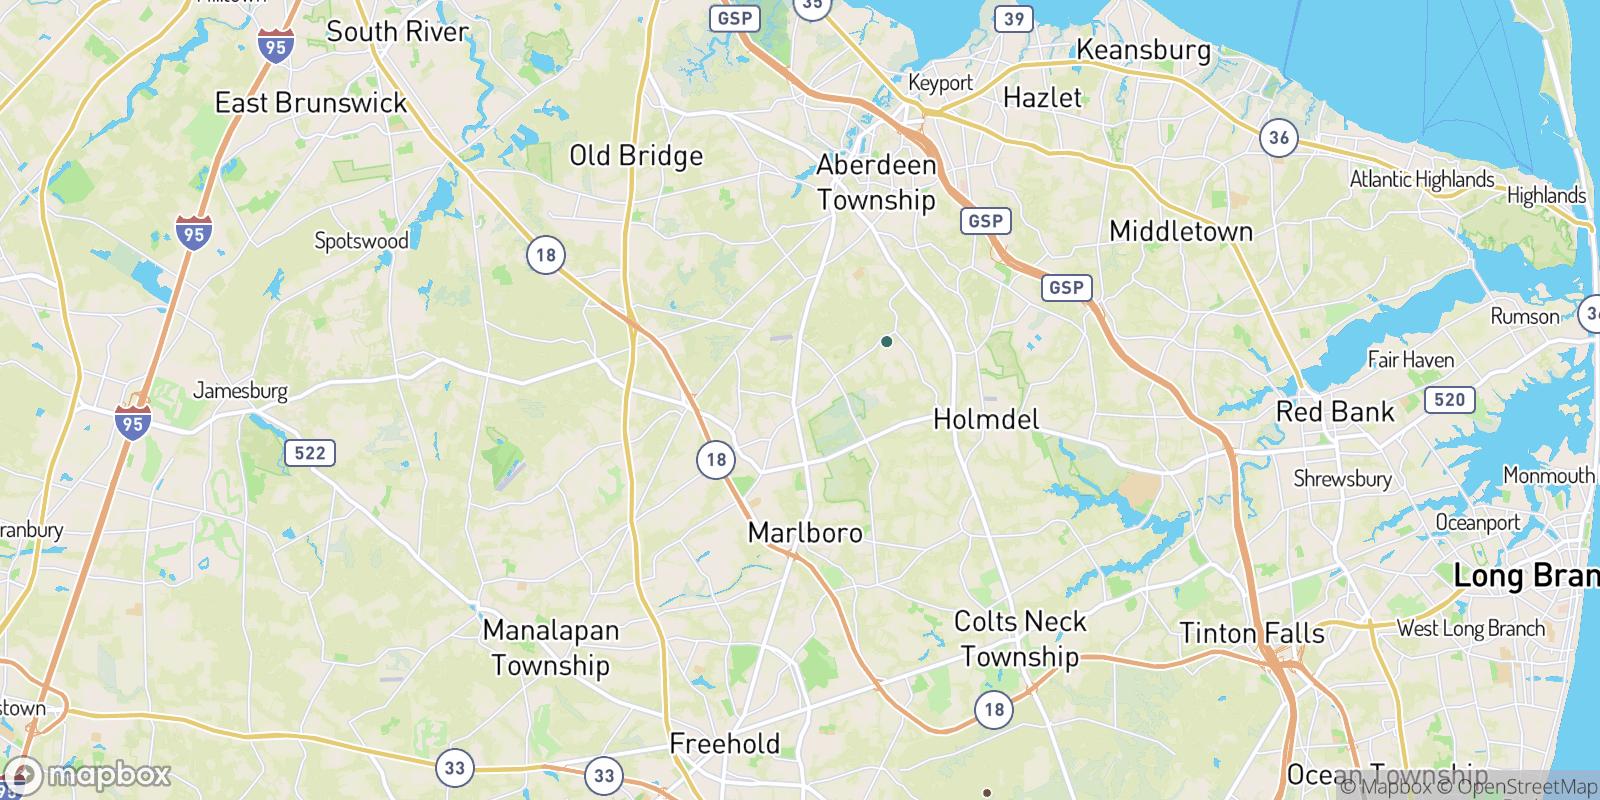 The best camping near Wickatunk, New Jersey